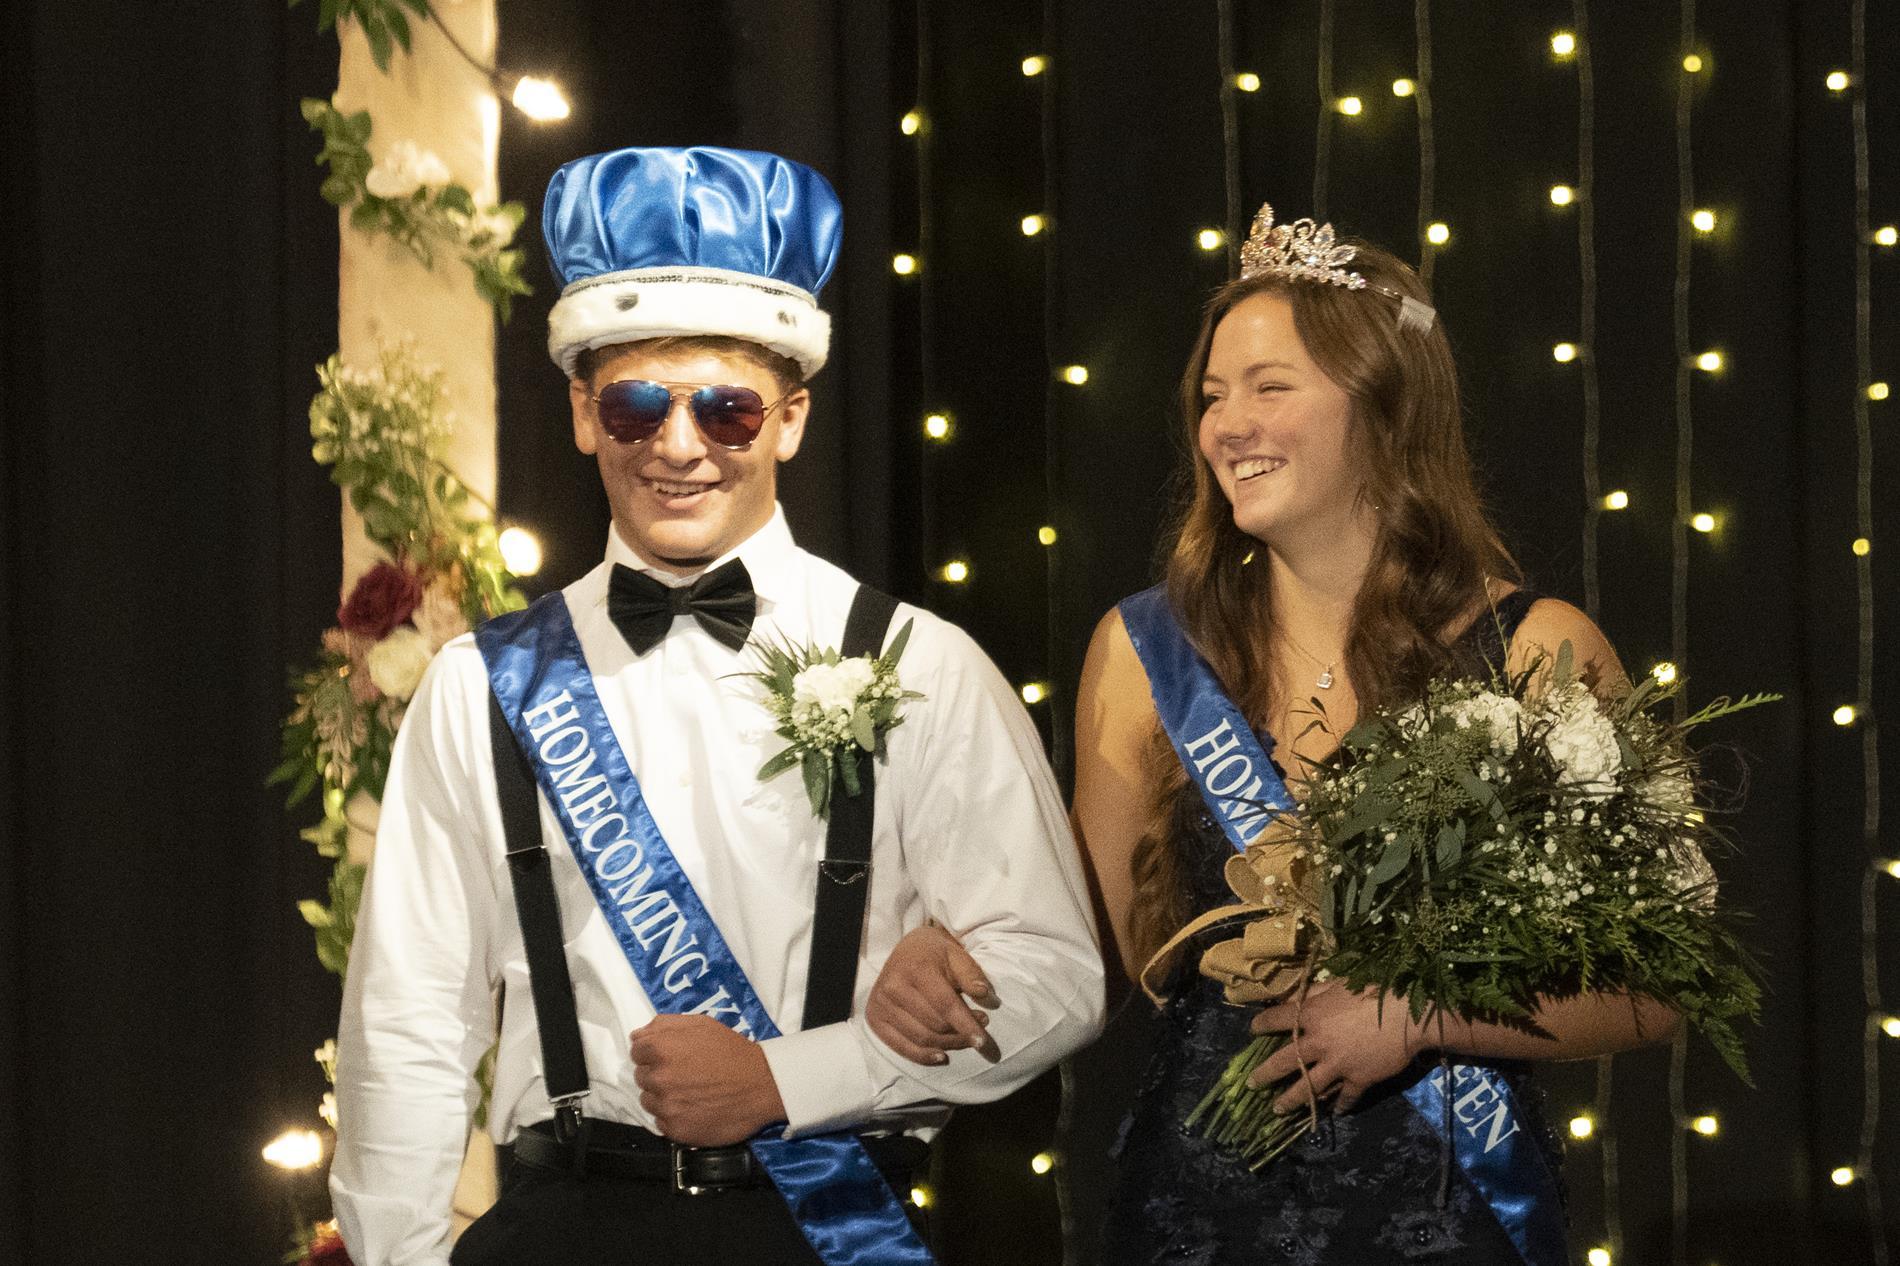 King Niemi and Queen Geiser